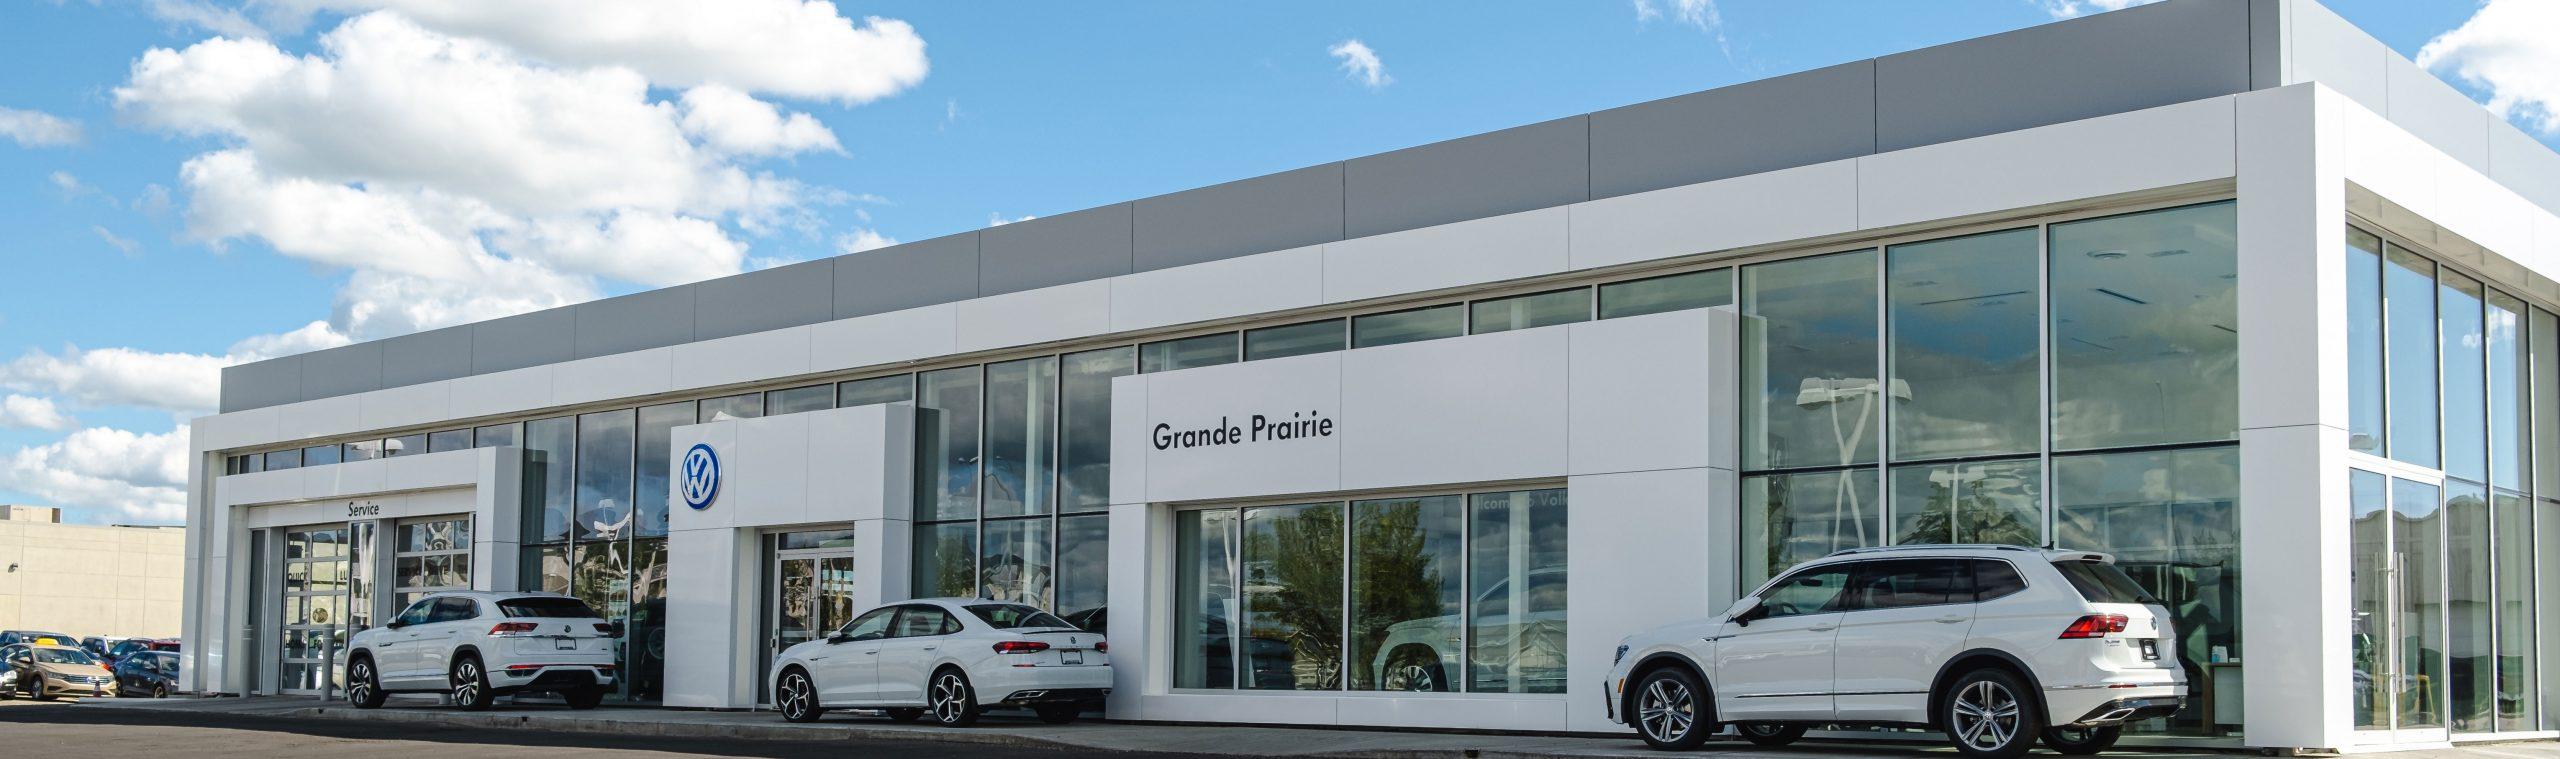 Grande Prairie VW